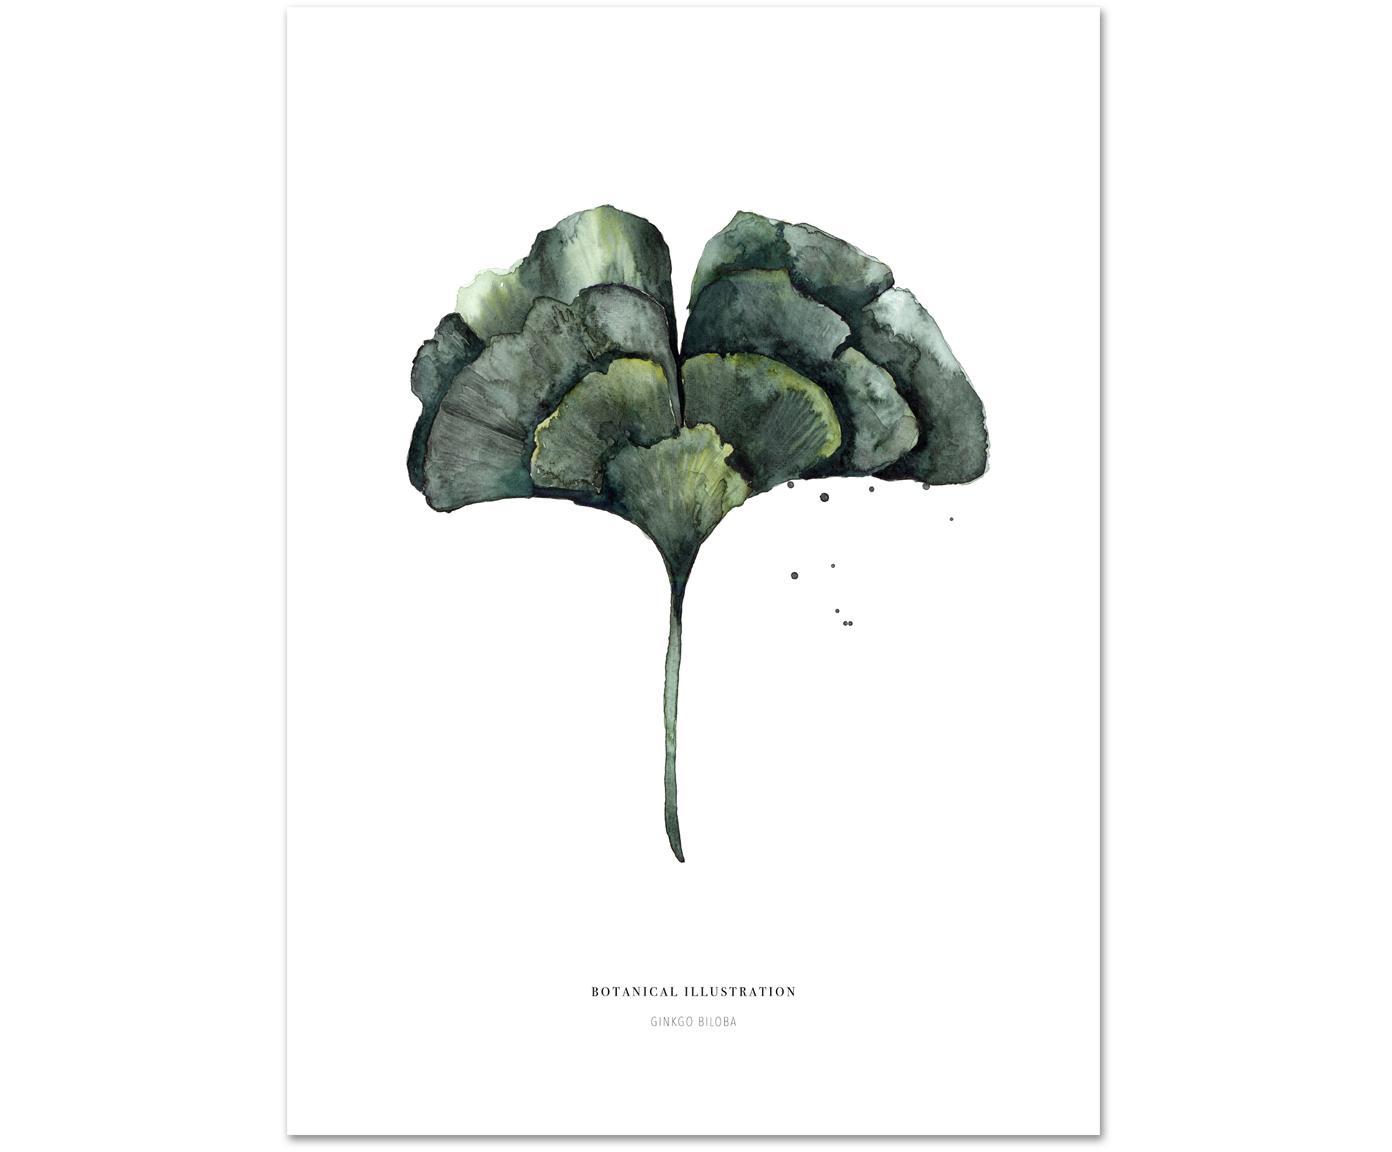 Poster Ginko, Stampa digitale su carta, 200 g/m², Bianco, verde, Larg. 21 x Alt. 30 cm